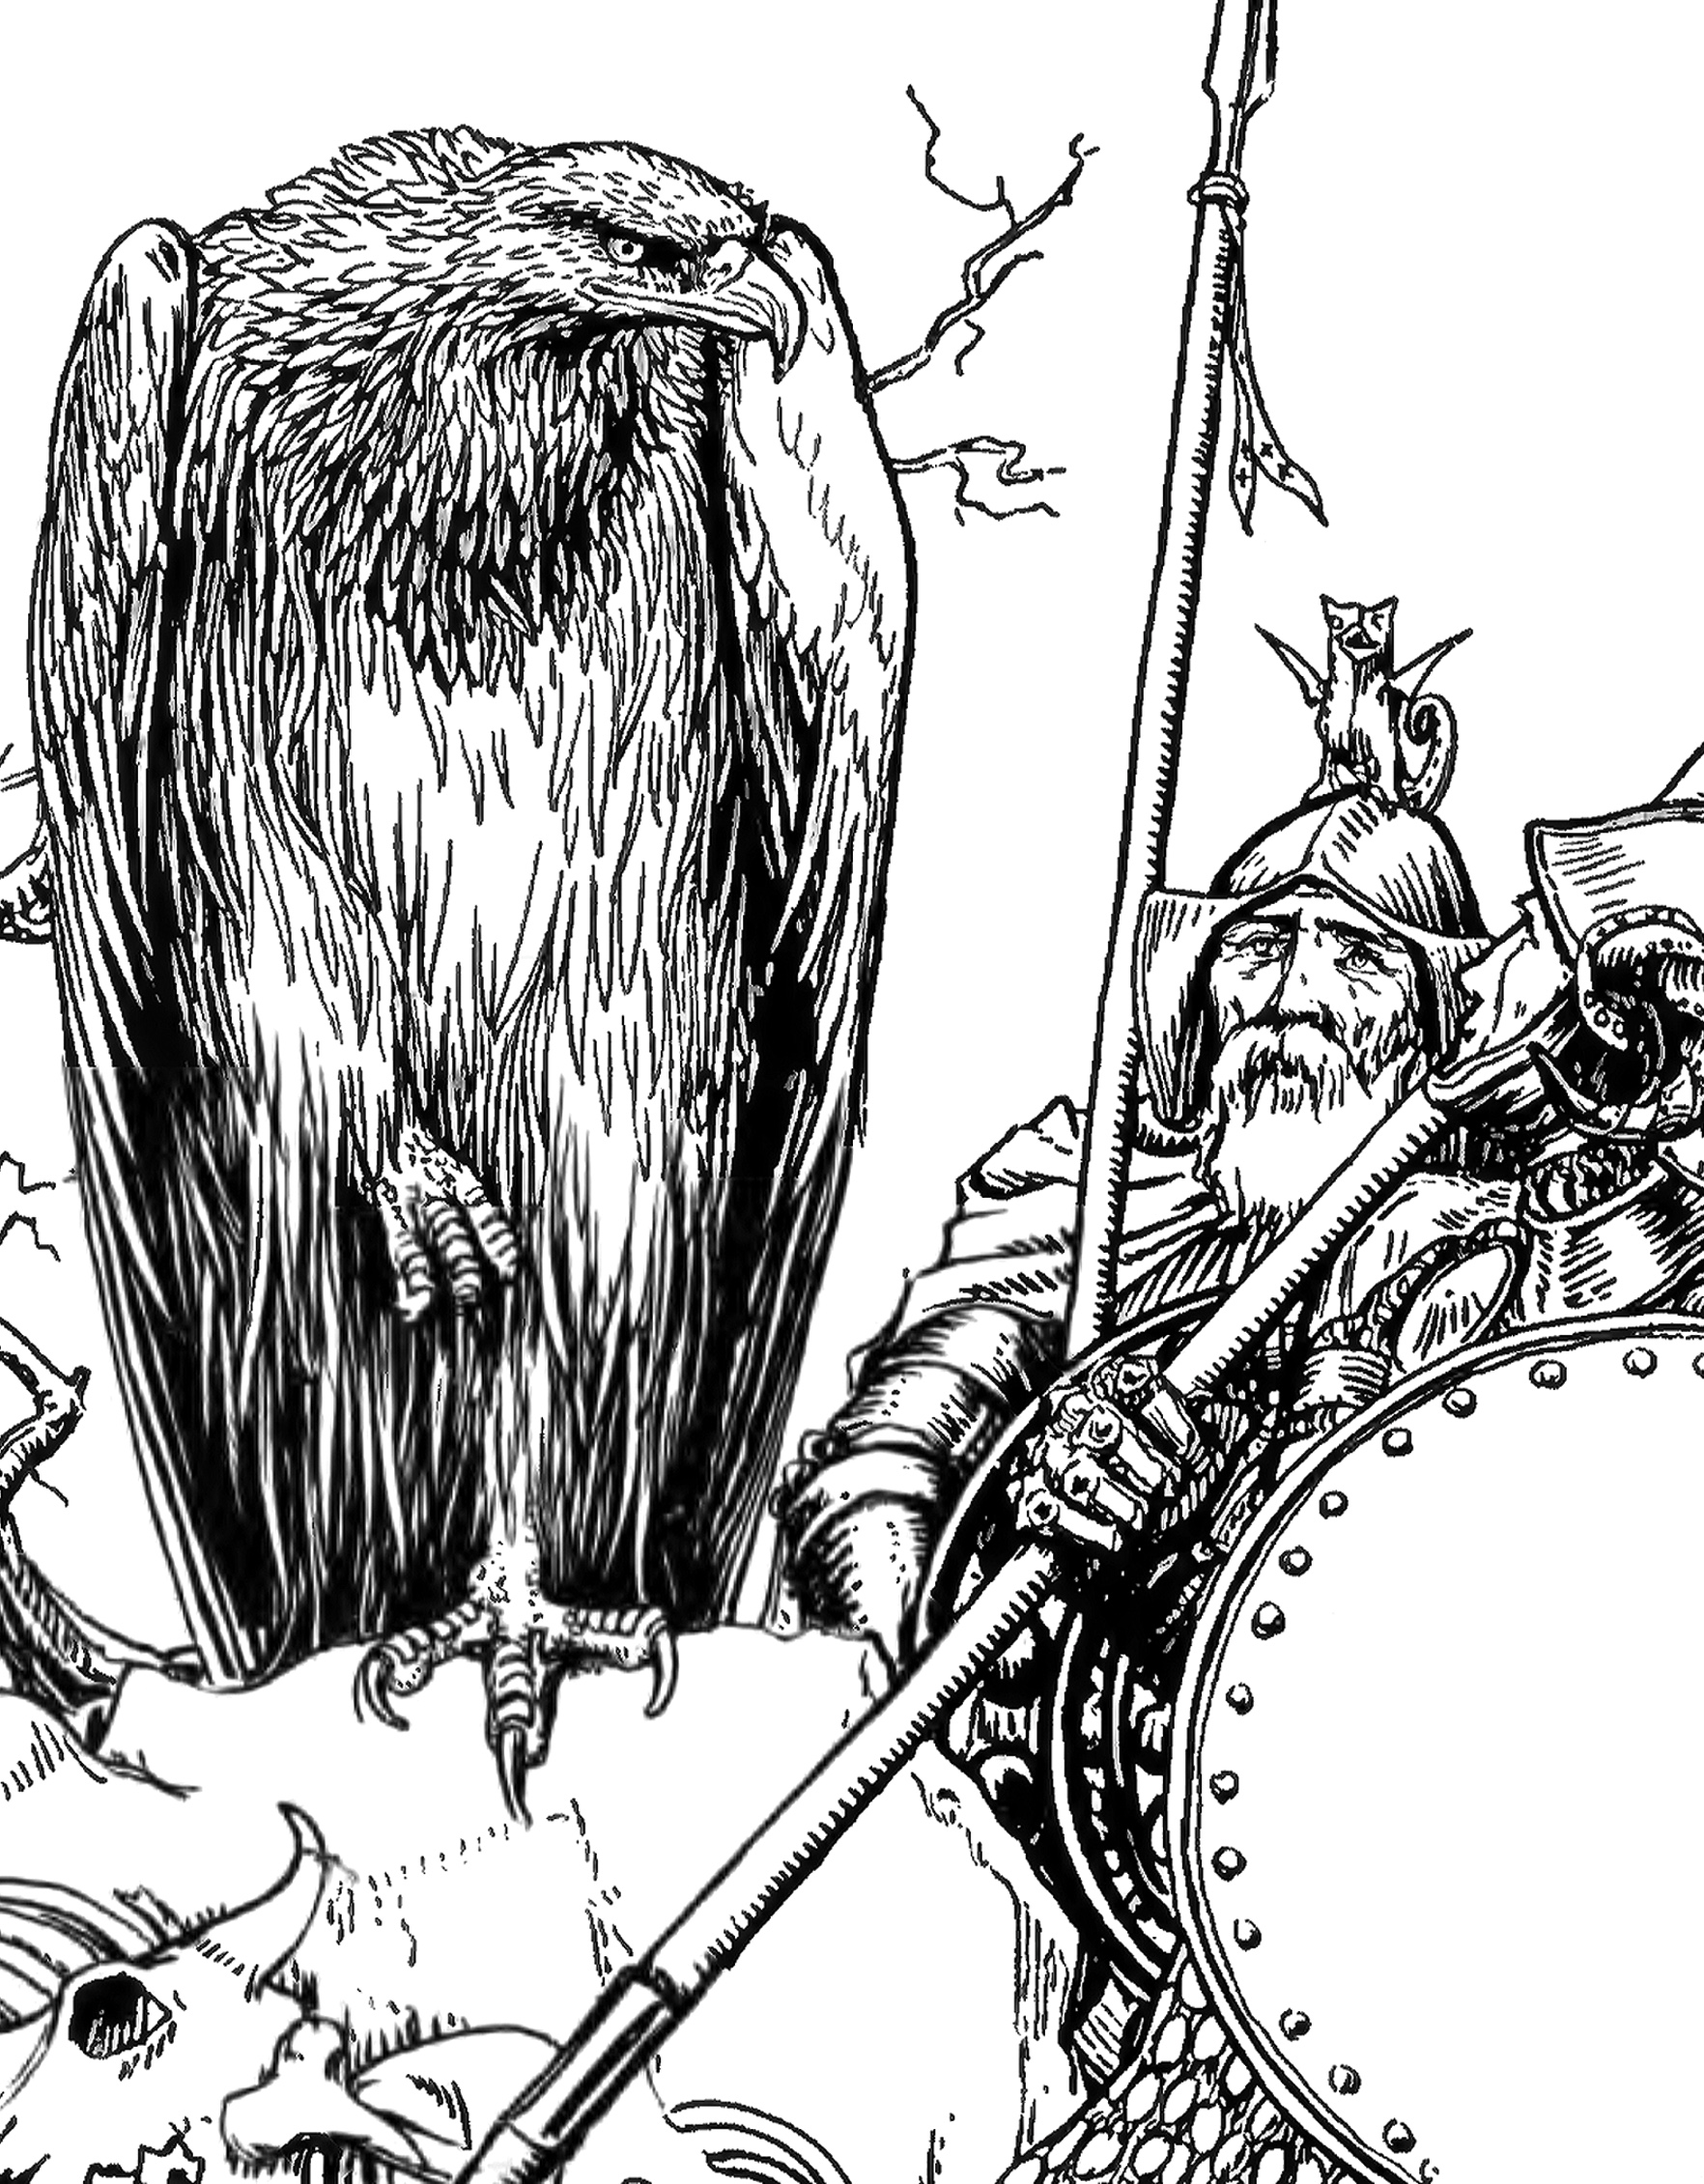 johnbatten_eagle.jpg